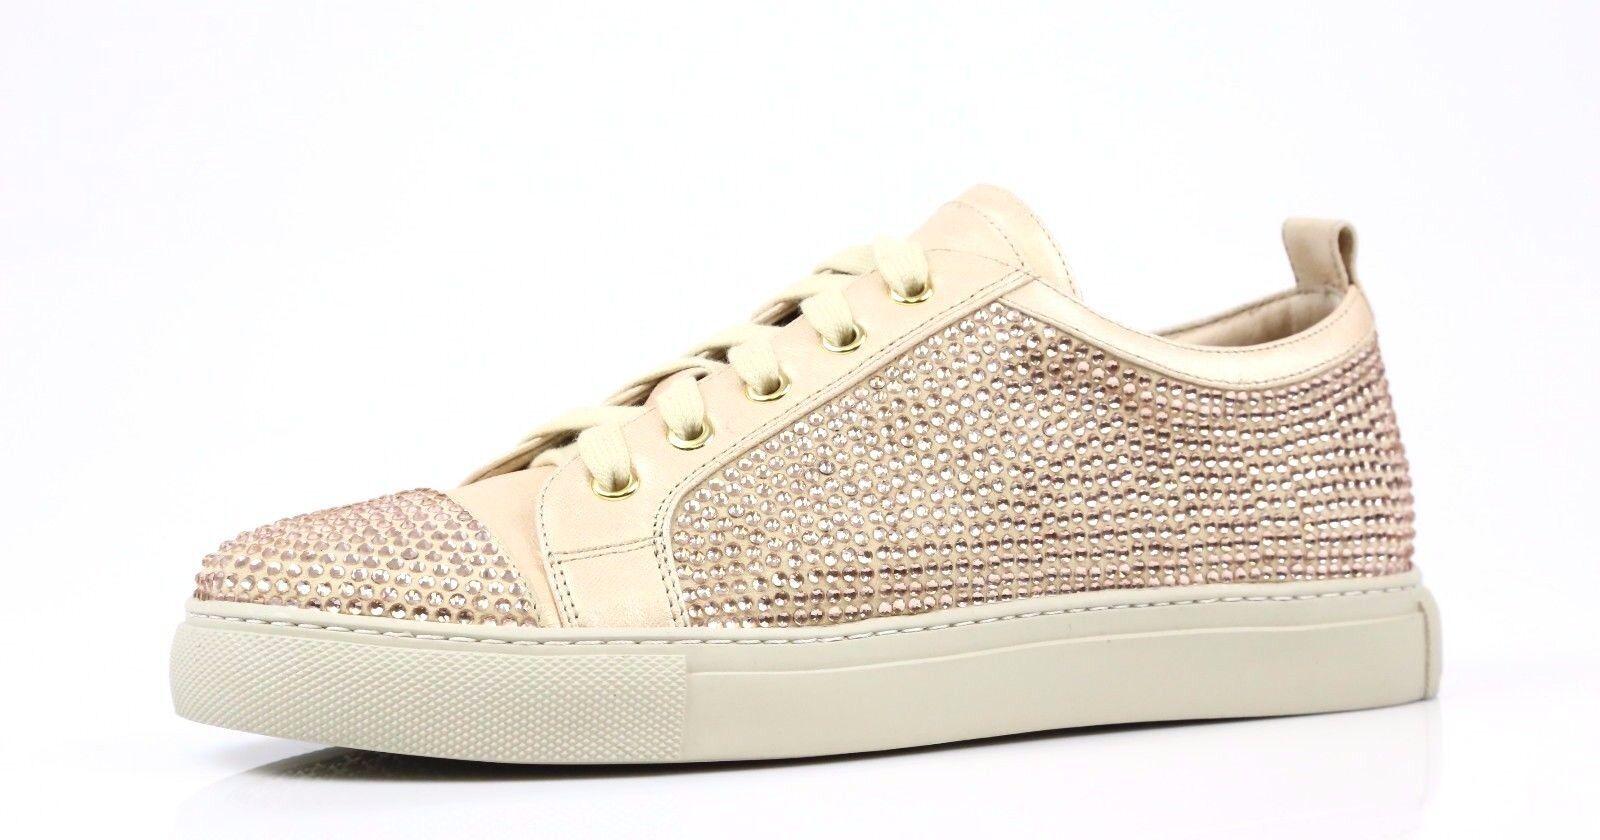 Lola Cruz NAVIMA Metallic Gold Jewel Fashion Sneakers Style T00BK 38 EU NEW!